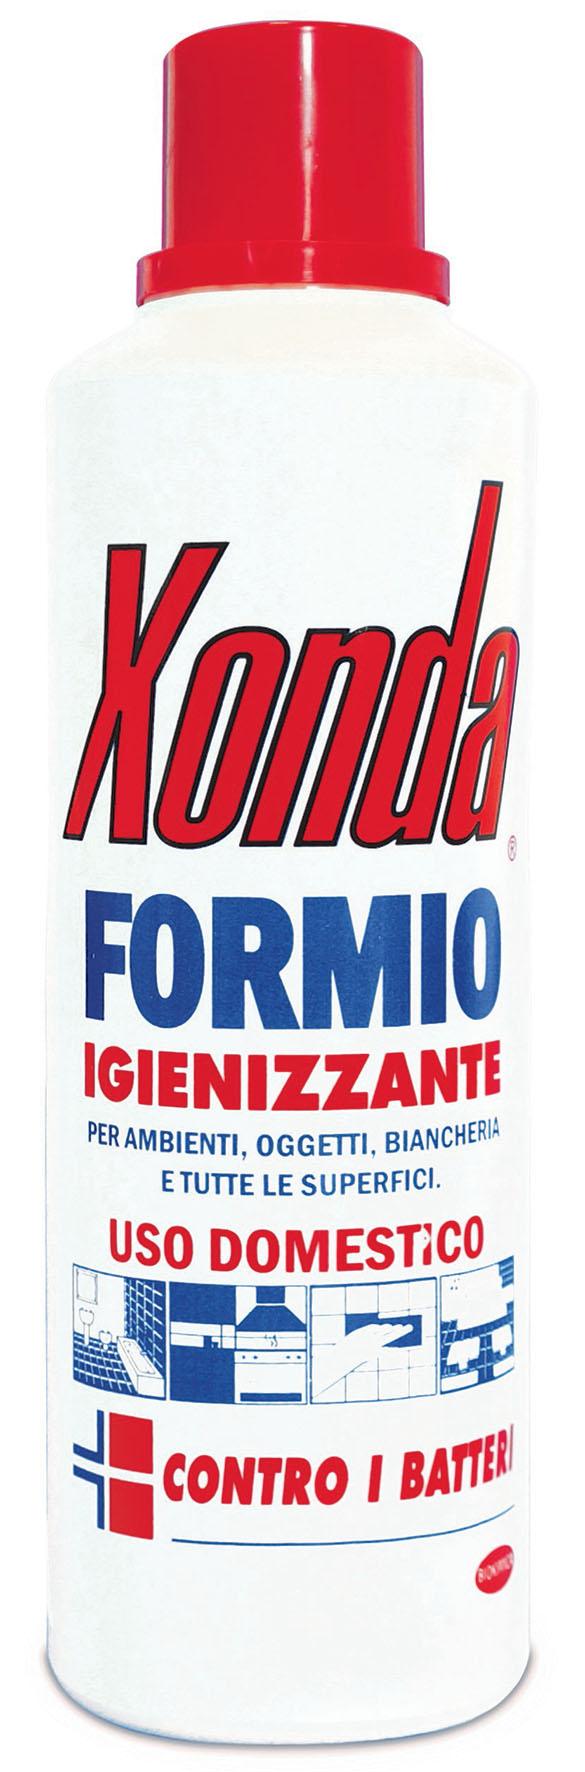 FORMIO IGIENIZZANTE 1L